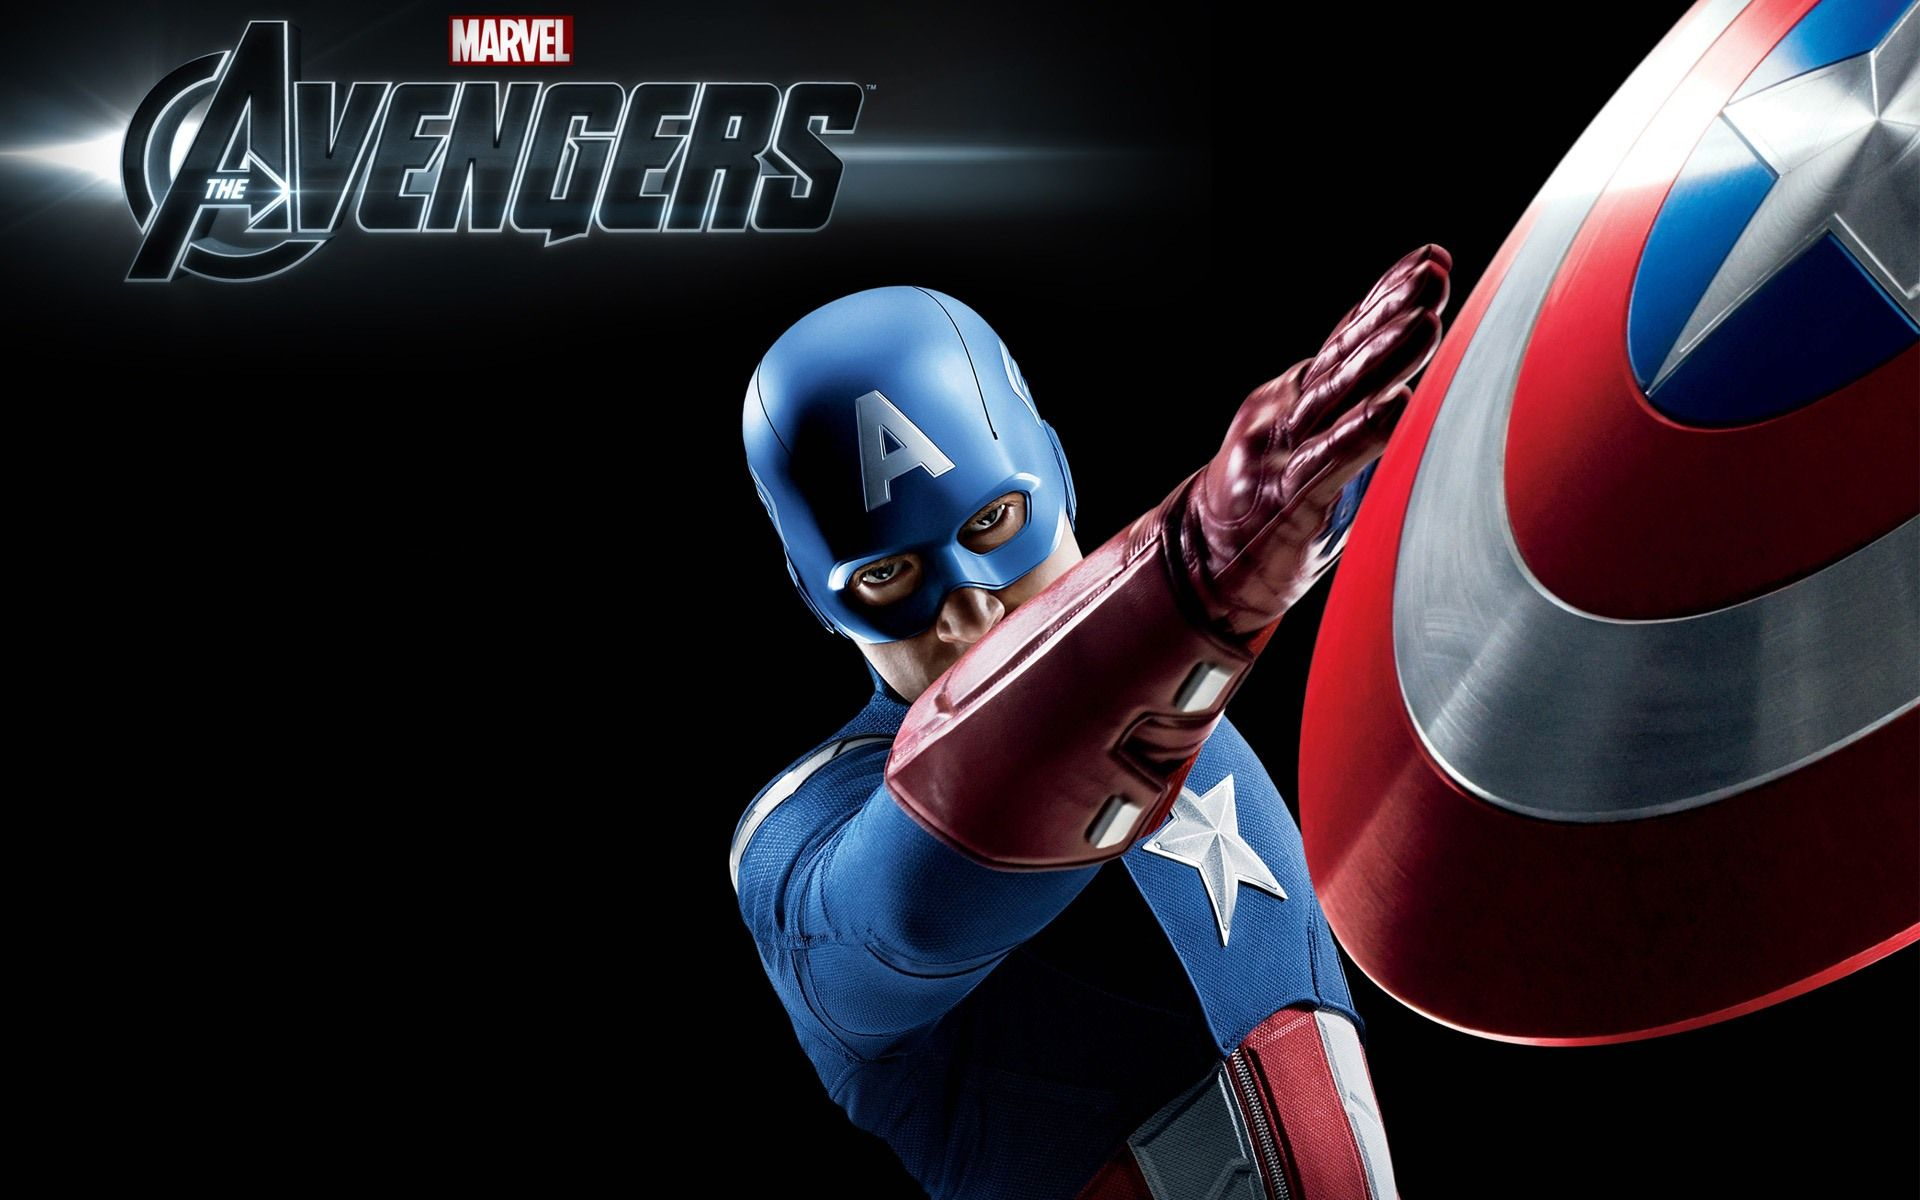 Avengers Background Images